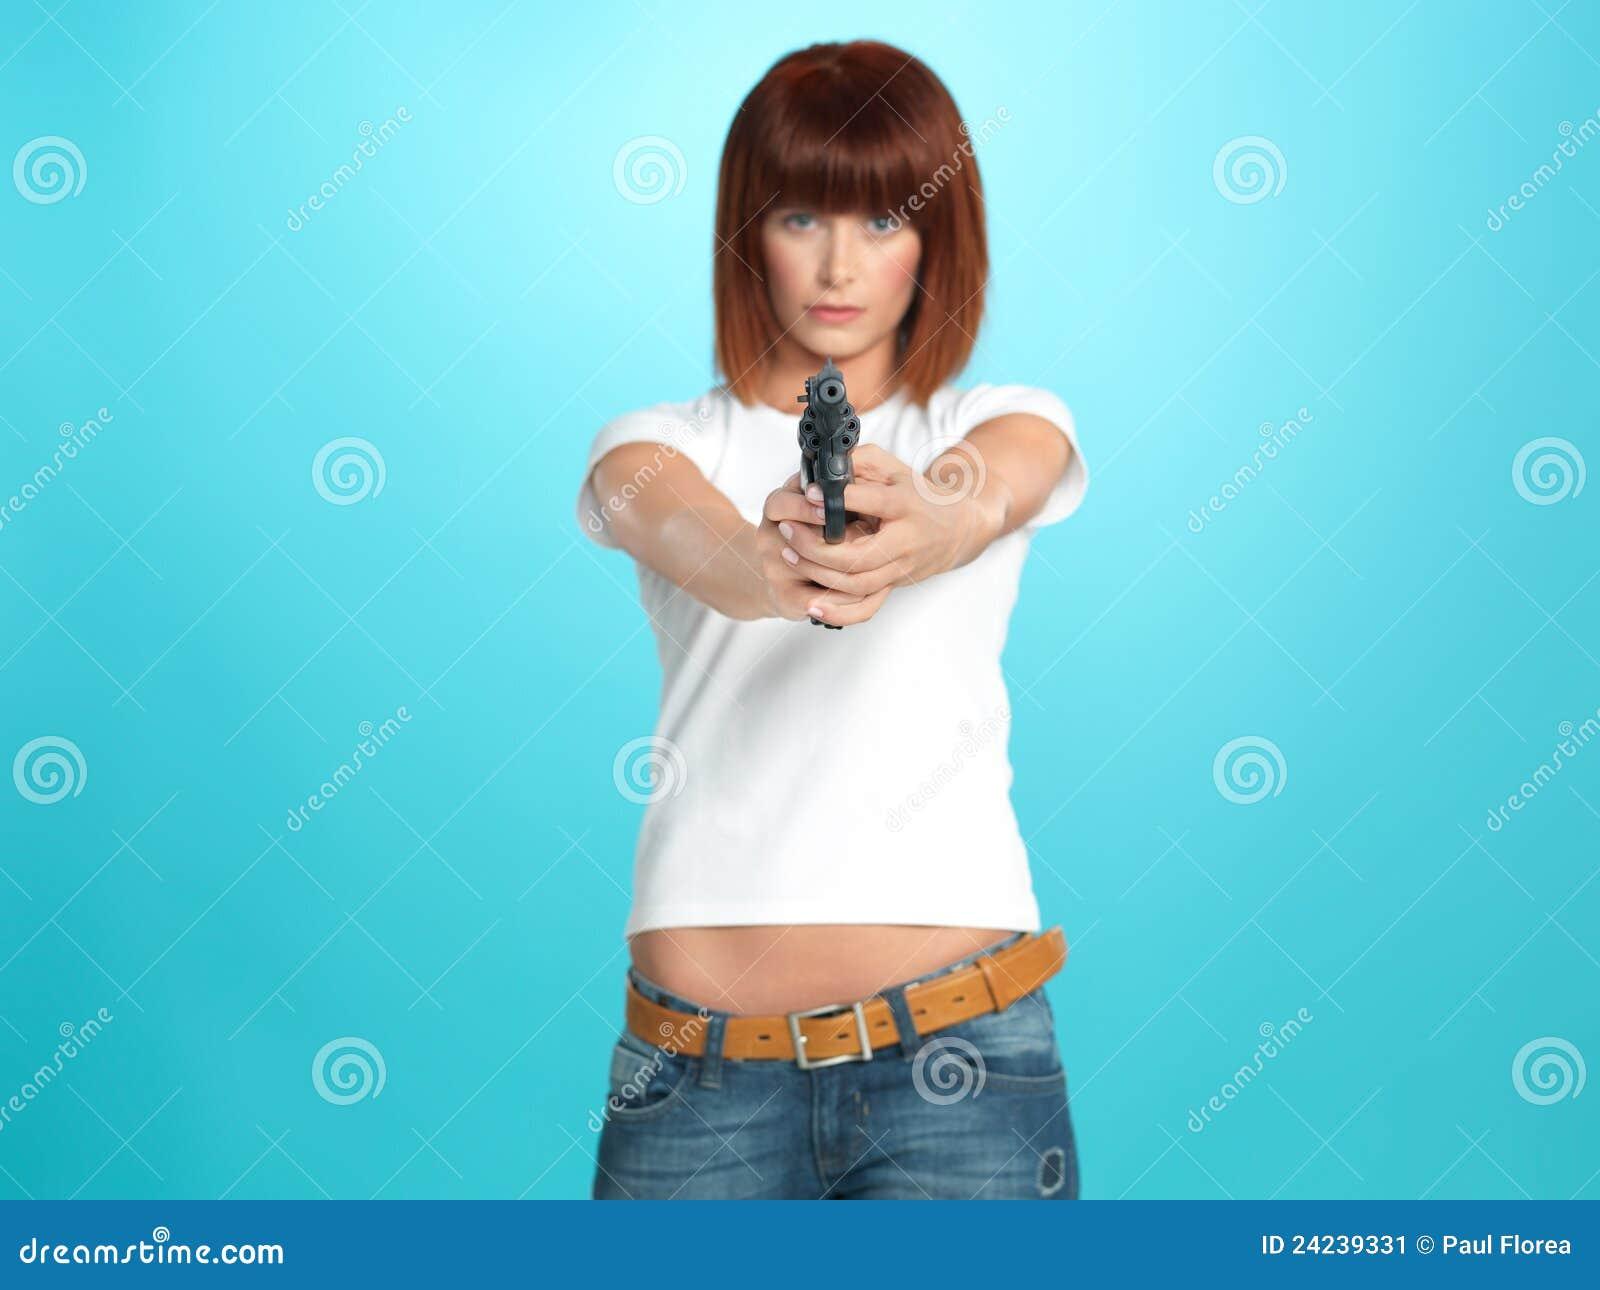 pointing gun Woman